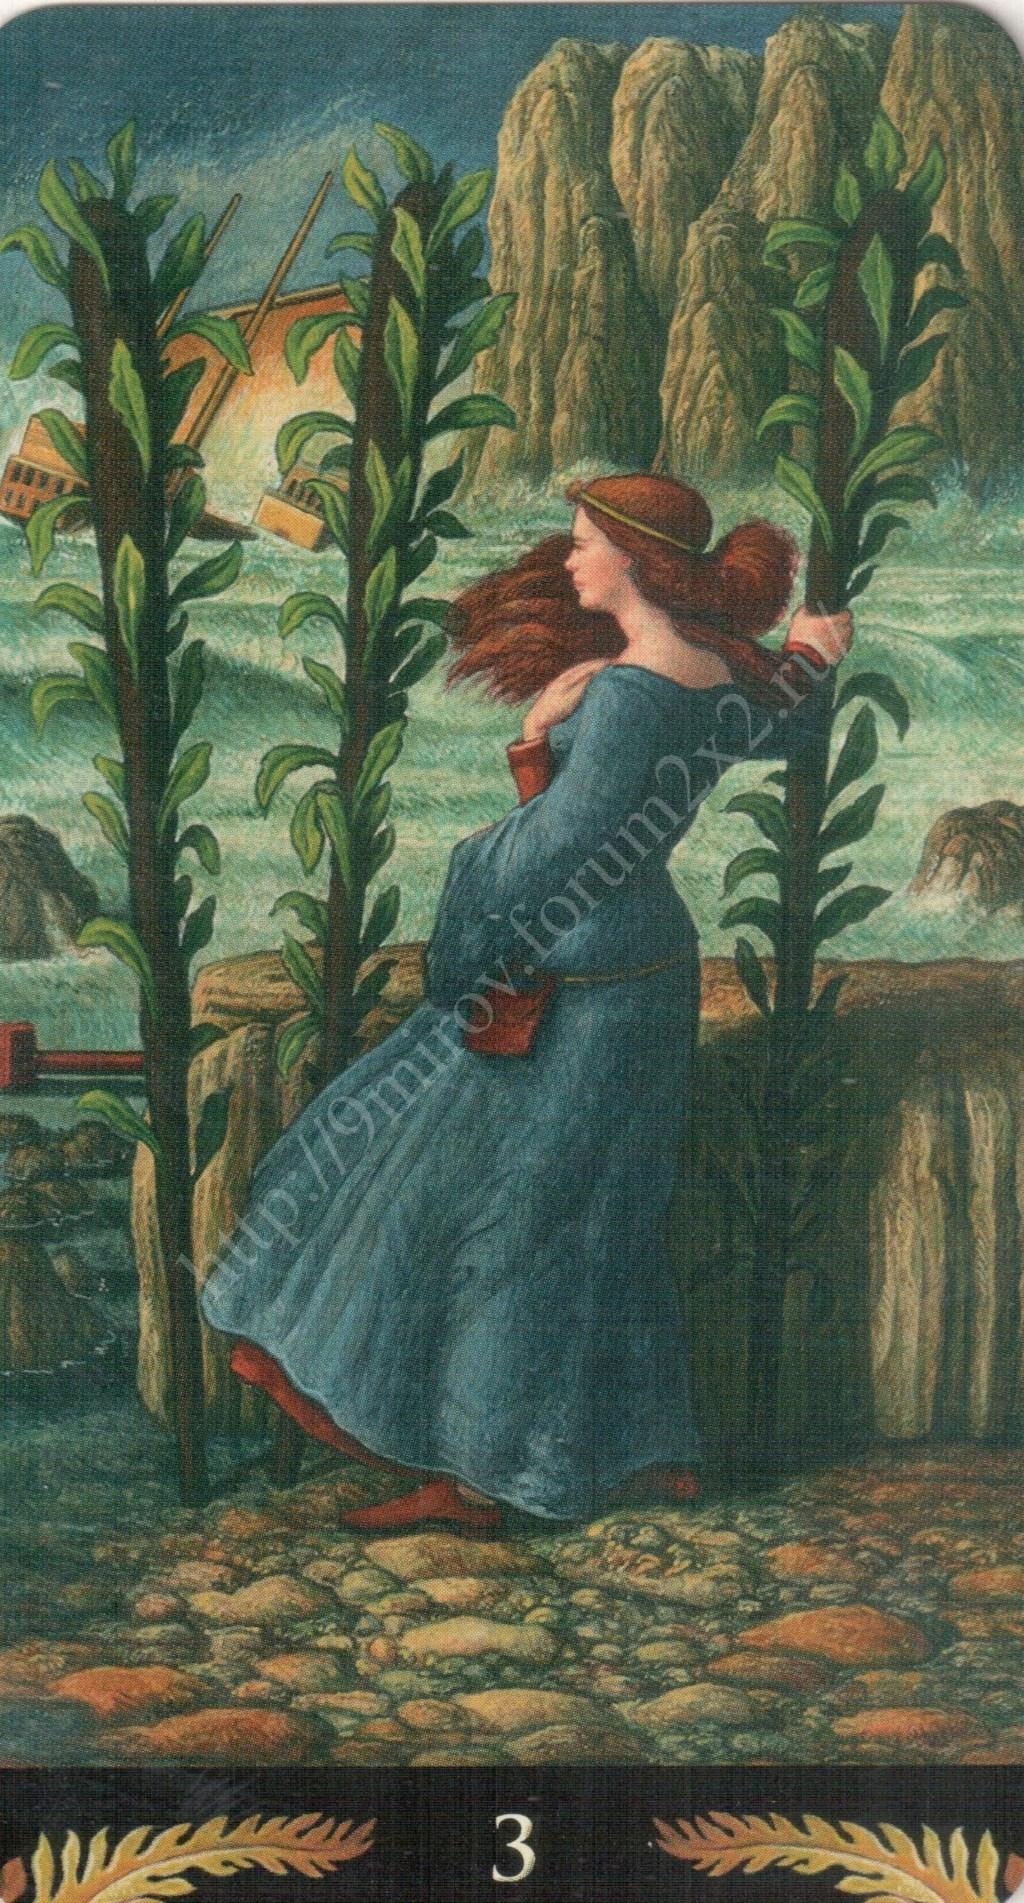 Таро Прерафаэлитов (Pre-Raphaelite Tarot) Галерея Water429